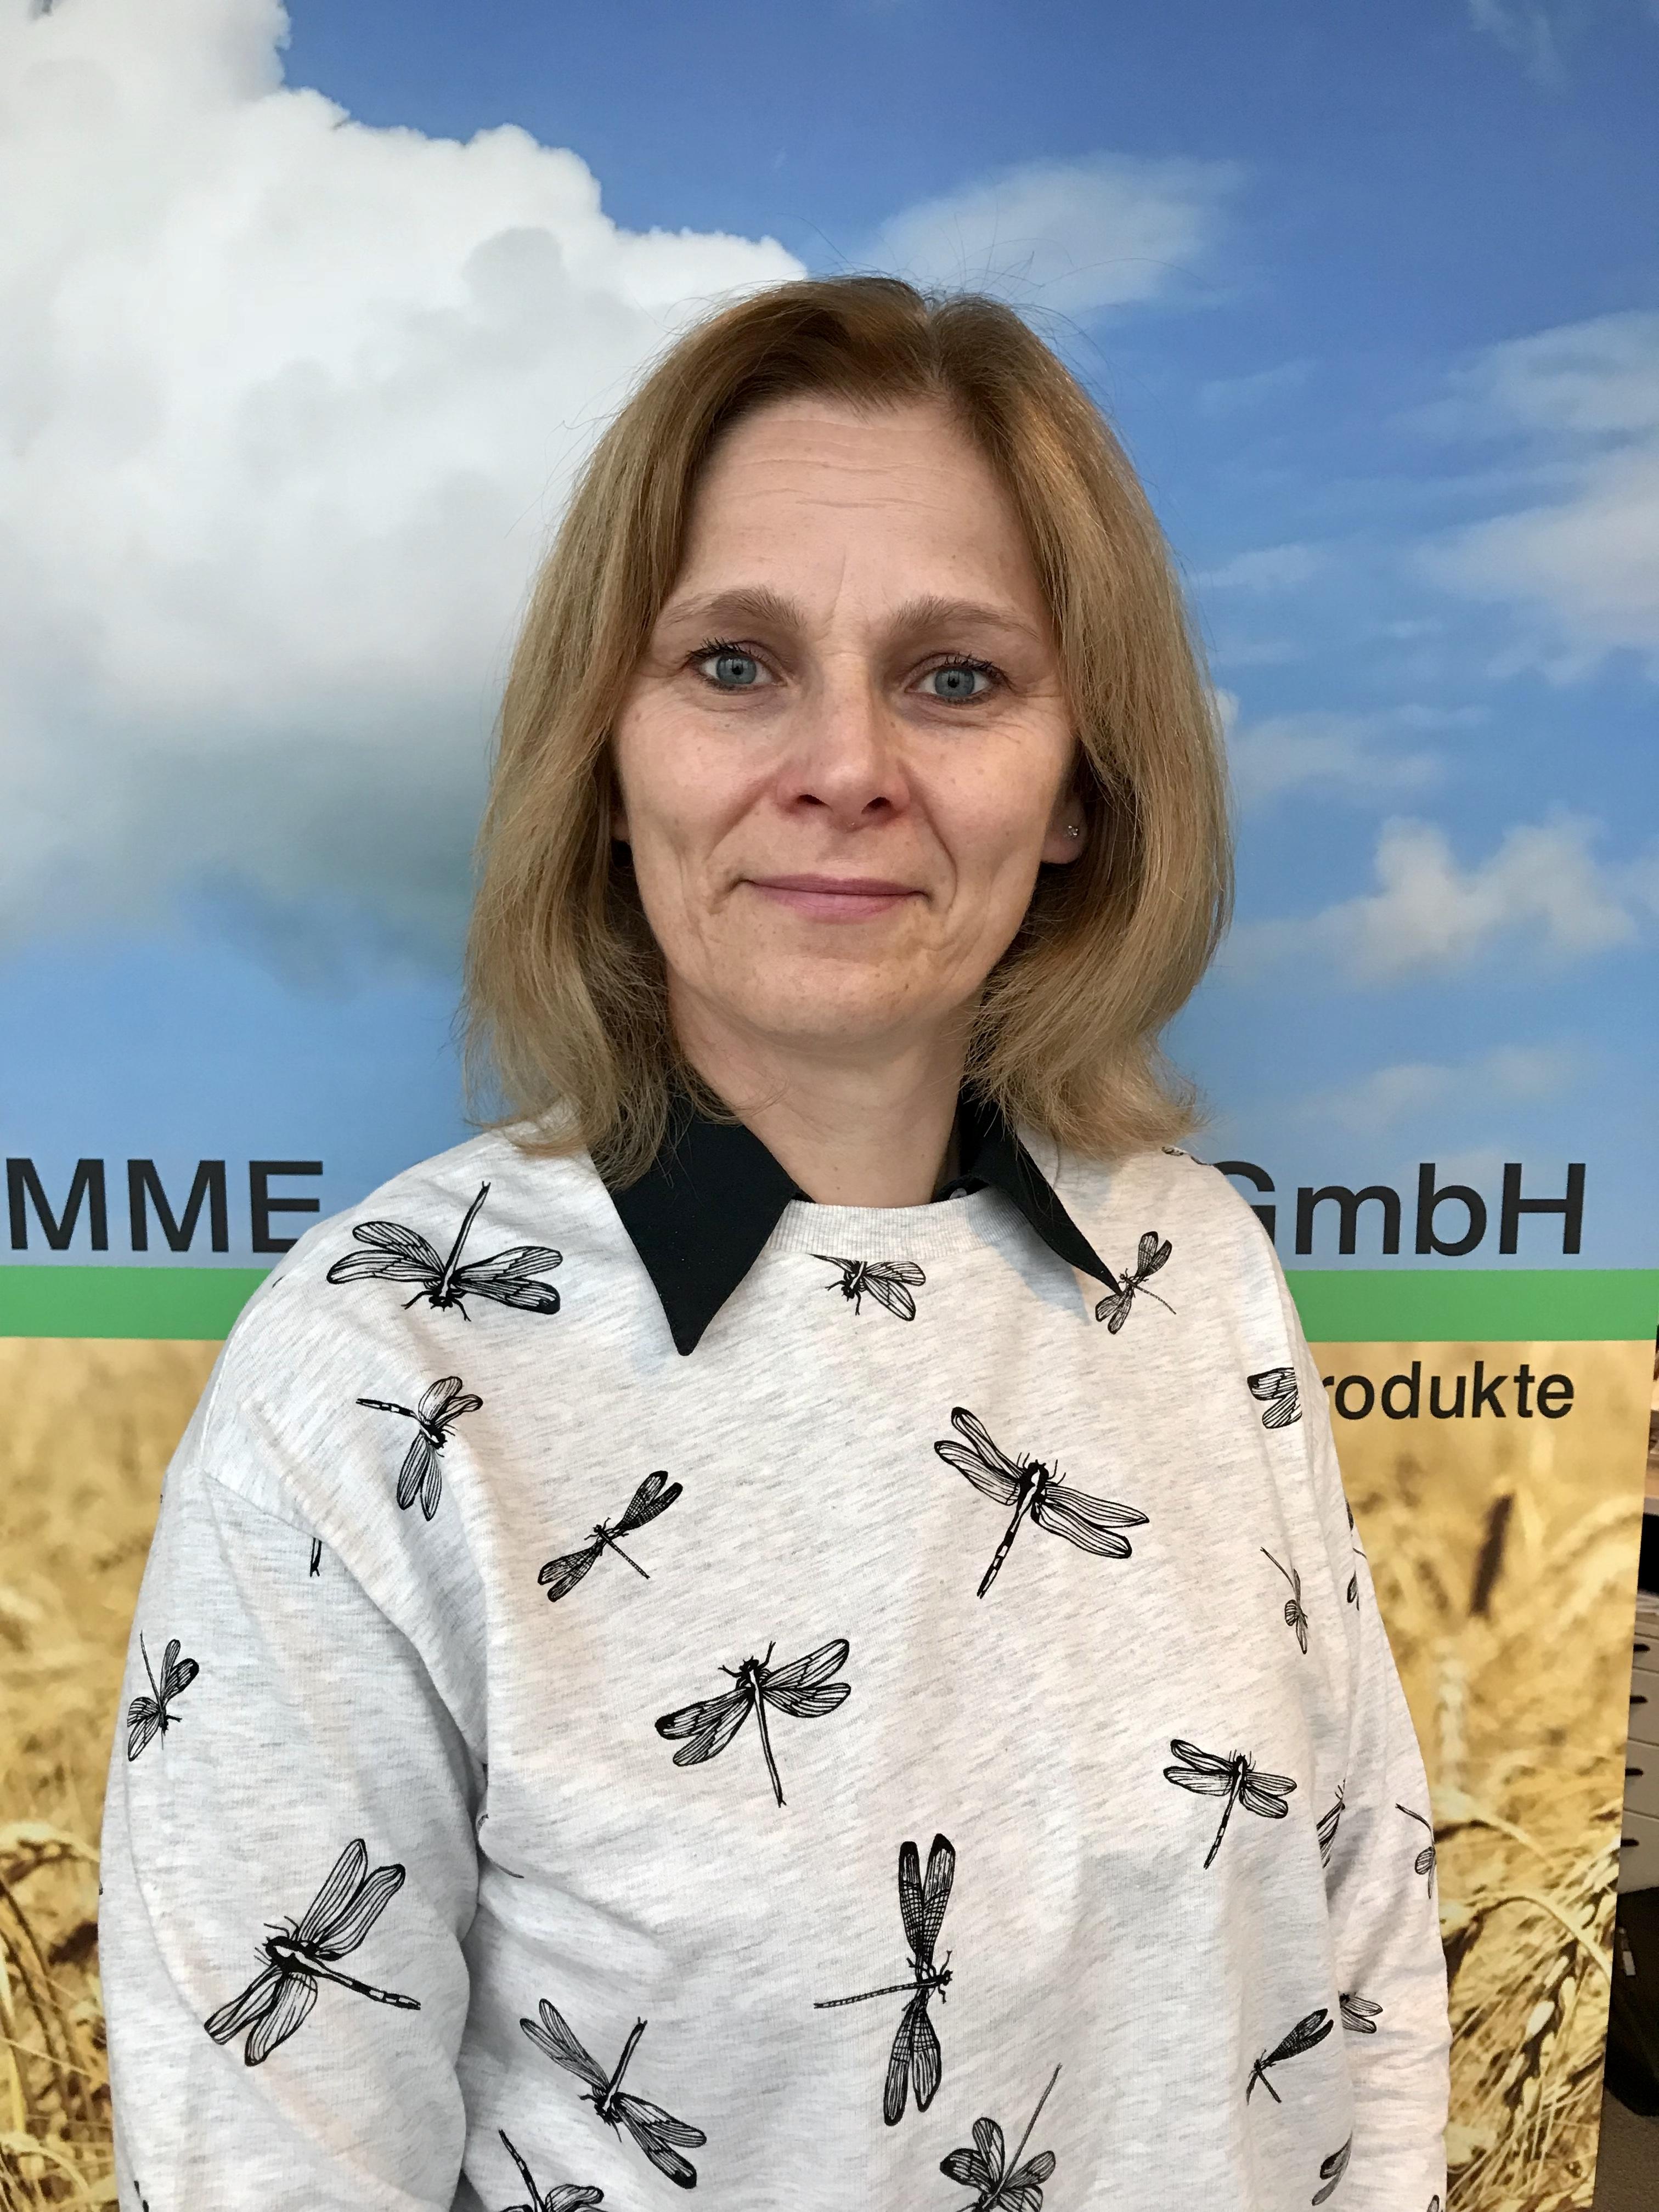 Diana Schön